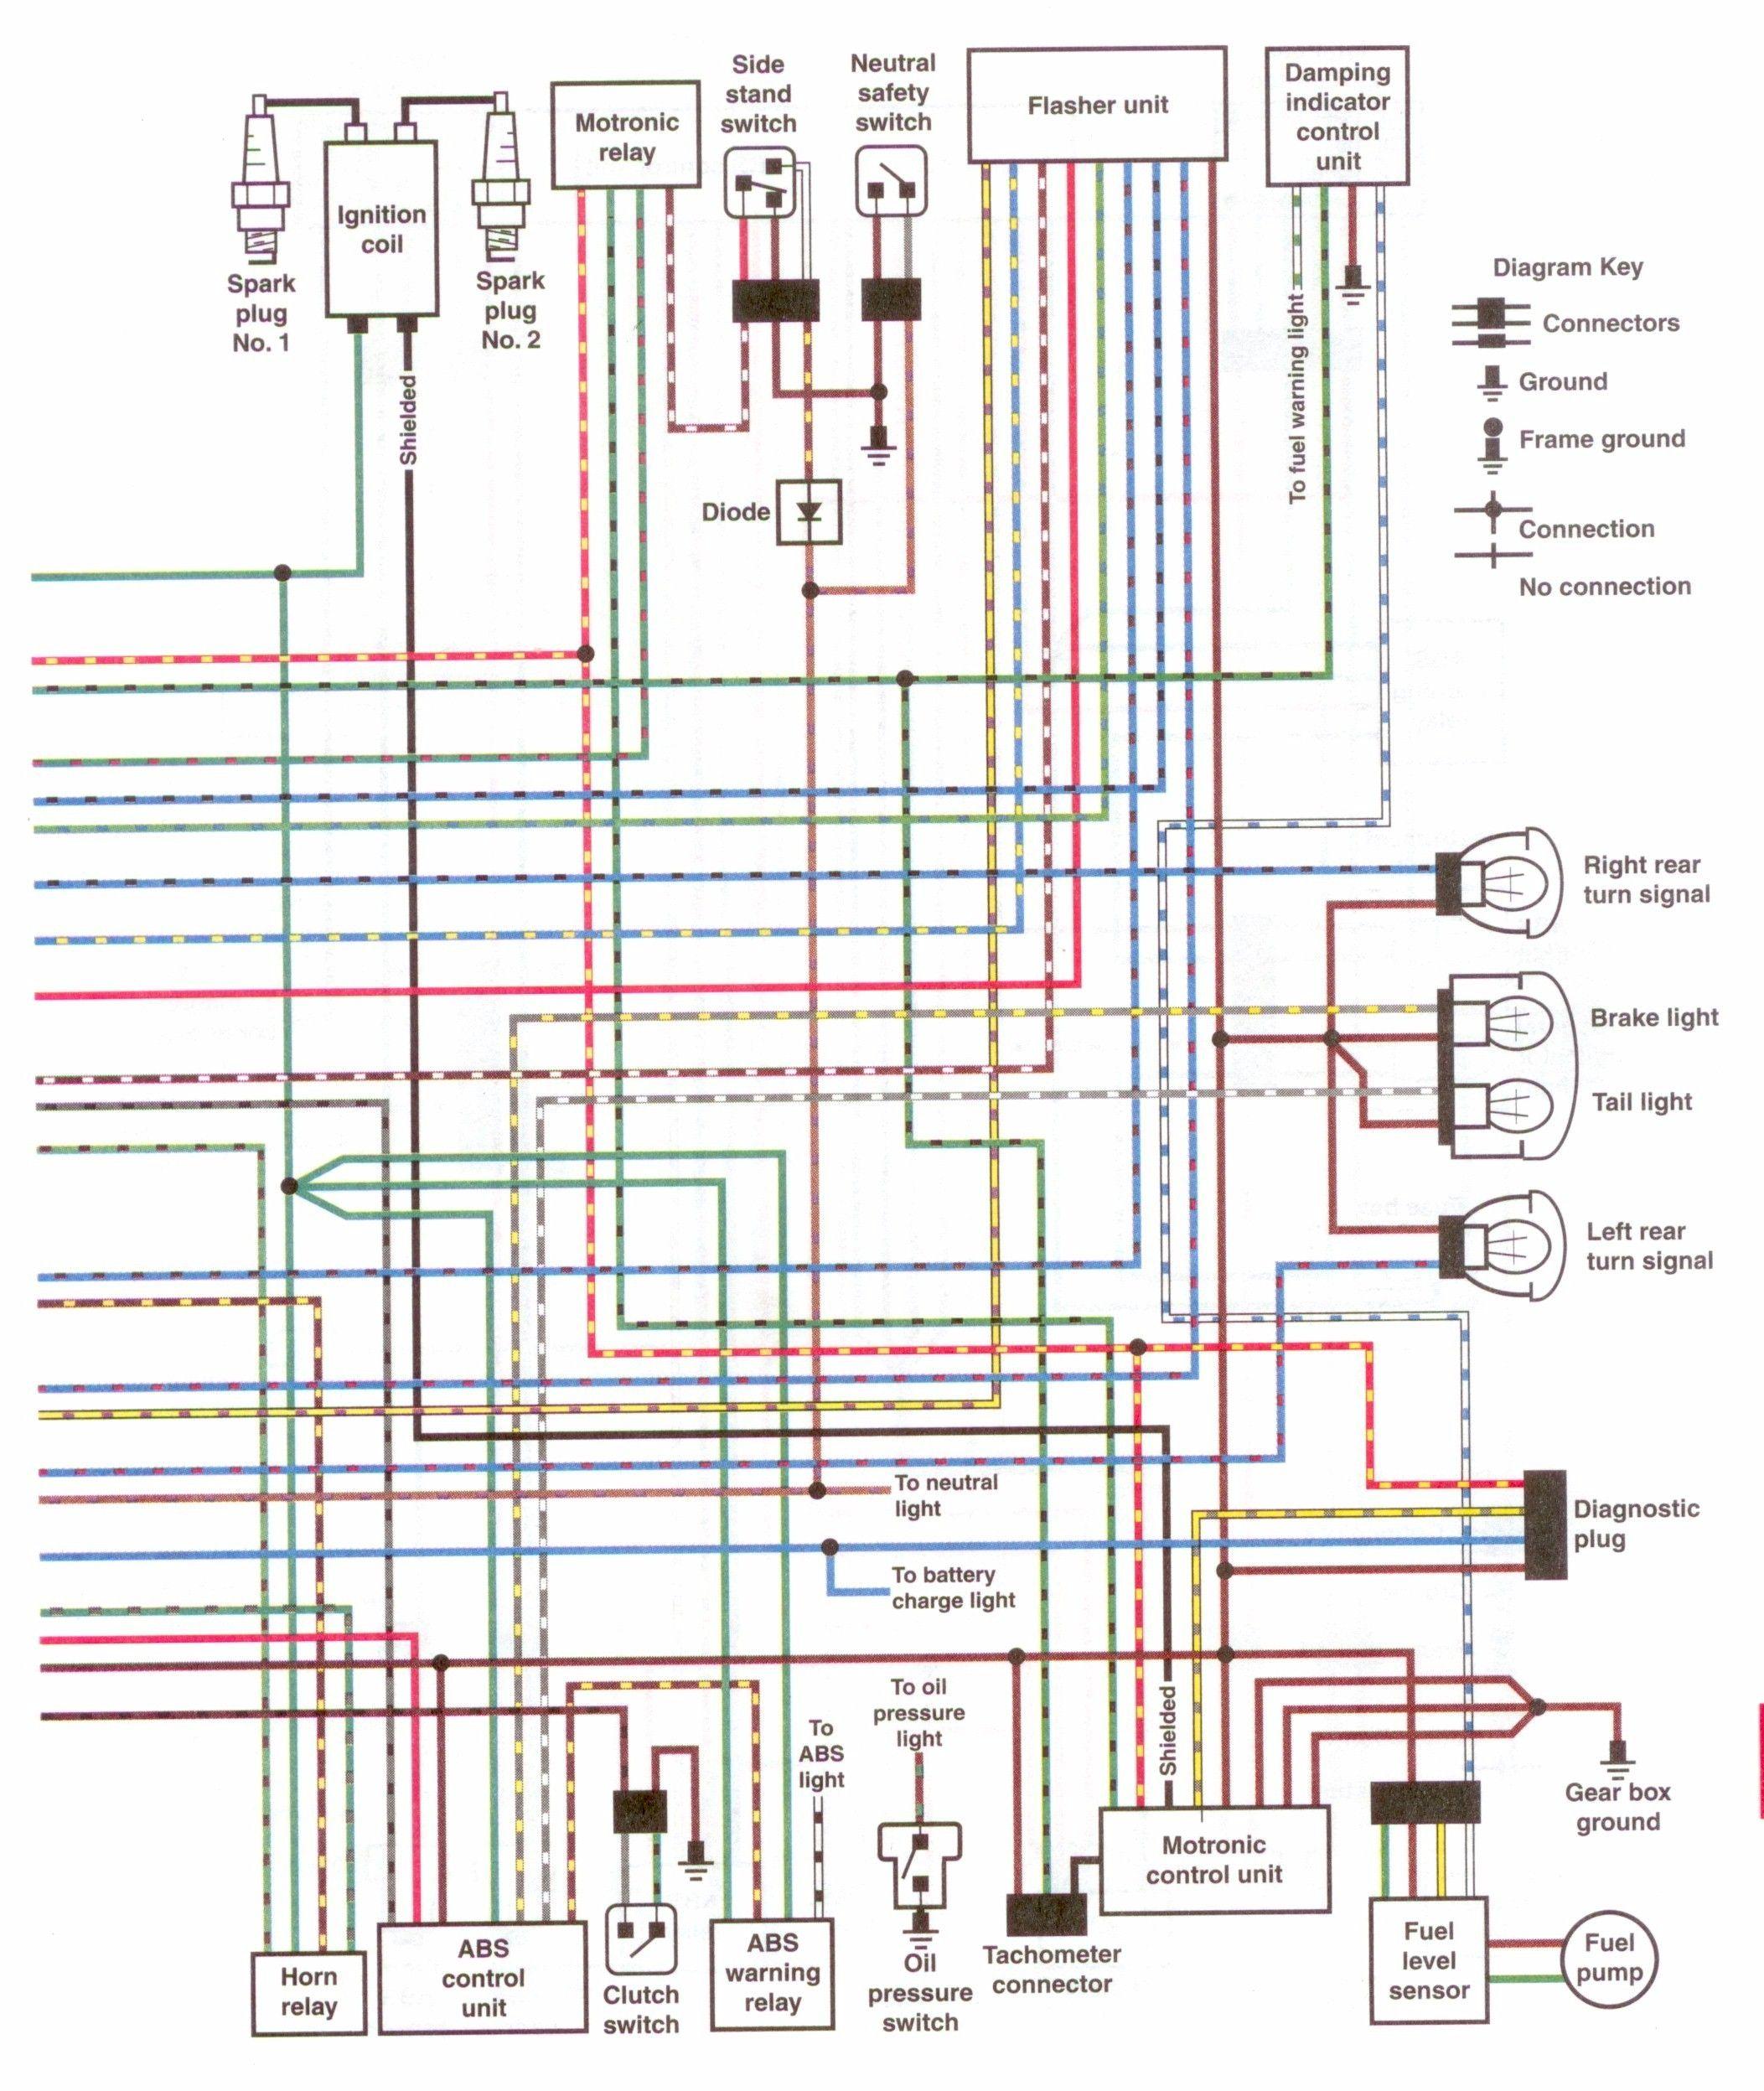 Bmw E46 Engine Wiring Diagram Pdf Diagram Diagramtemplate Diagramsample Bmw E46 Diagram Bmw